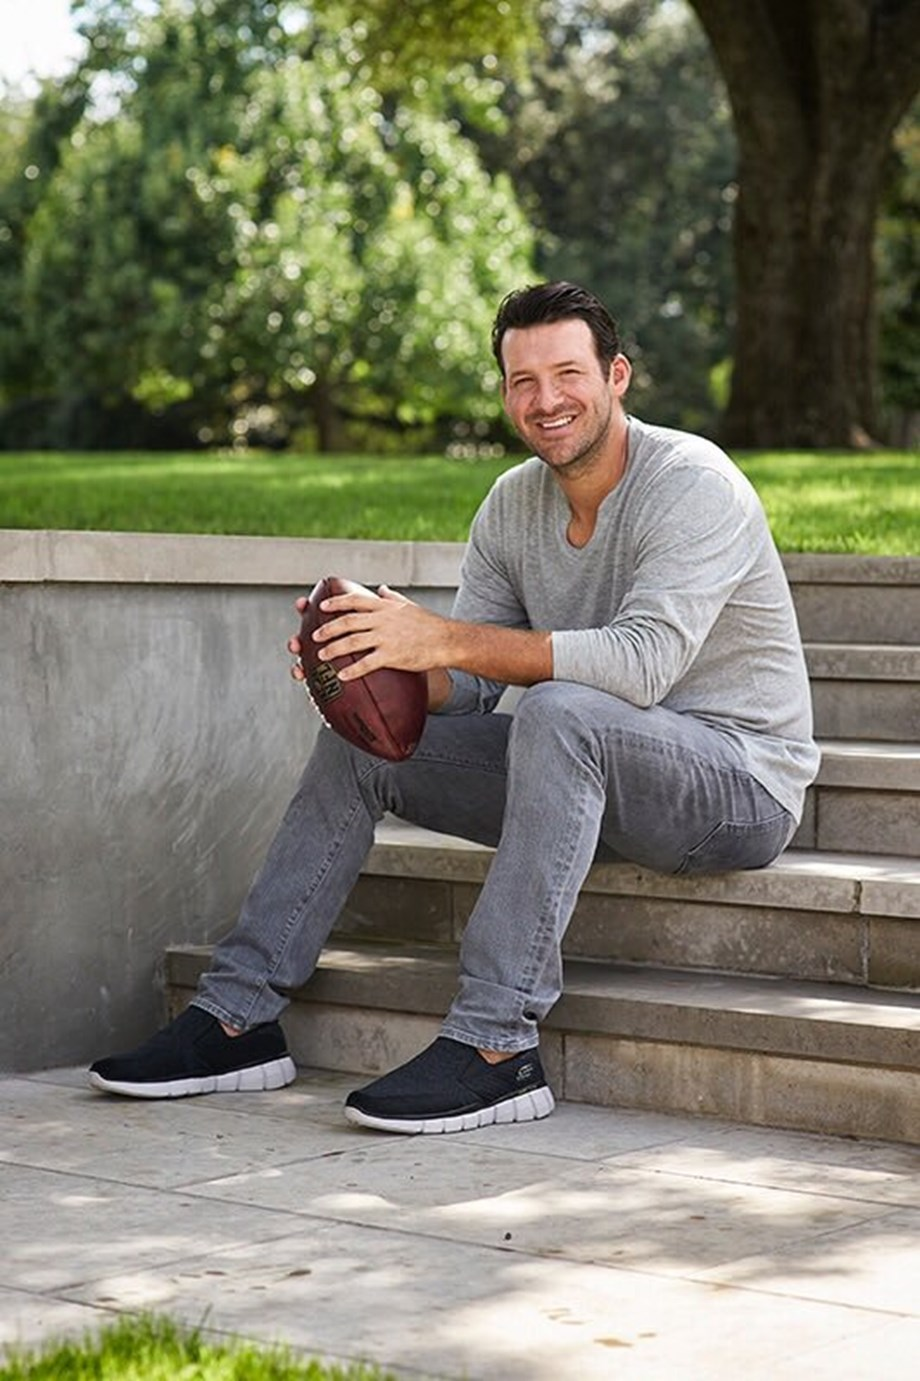 Tony Romo rallies to win celebrity golf tourney, Barkley finishes last